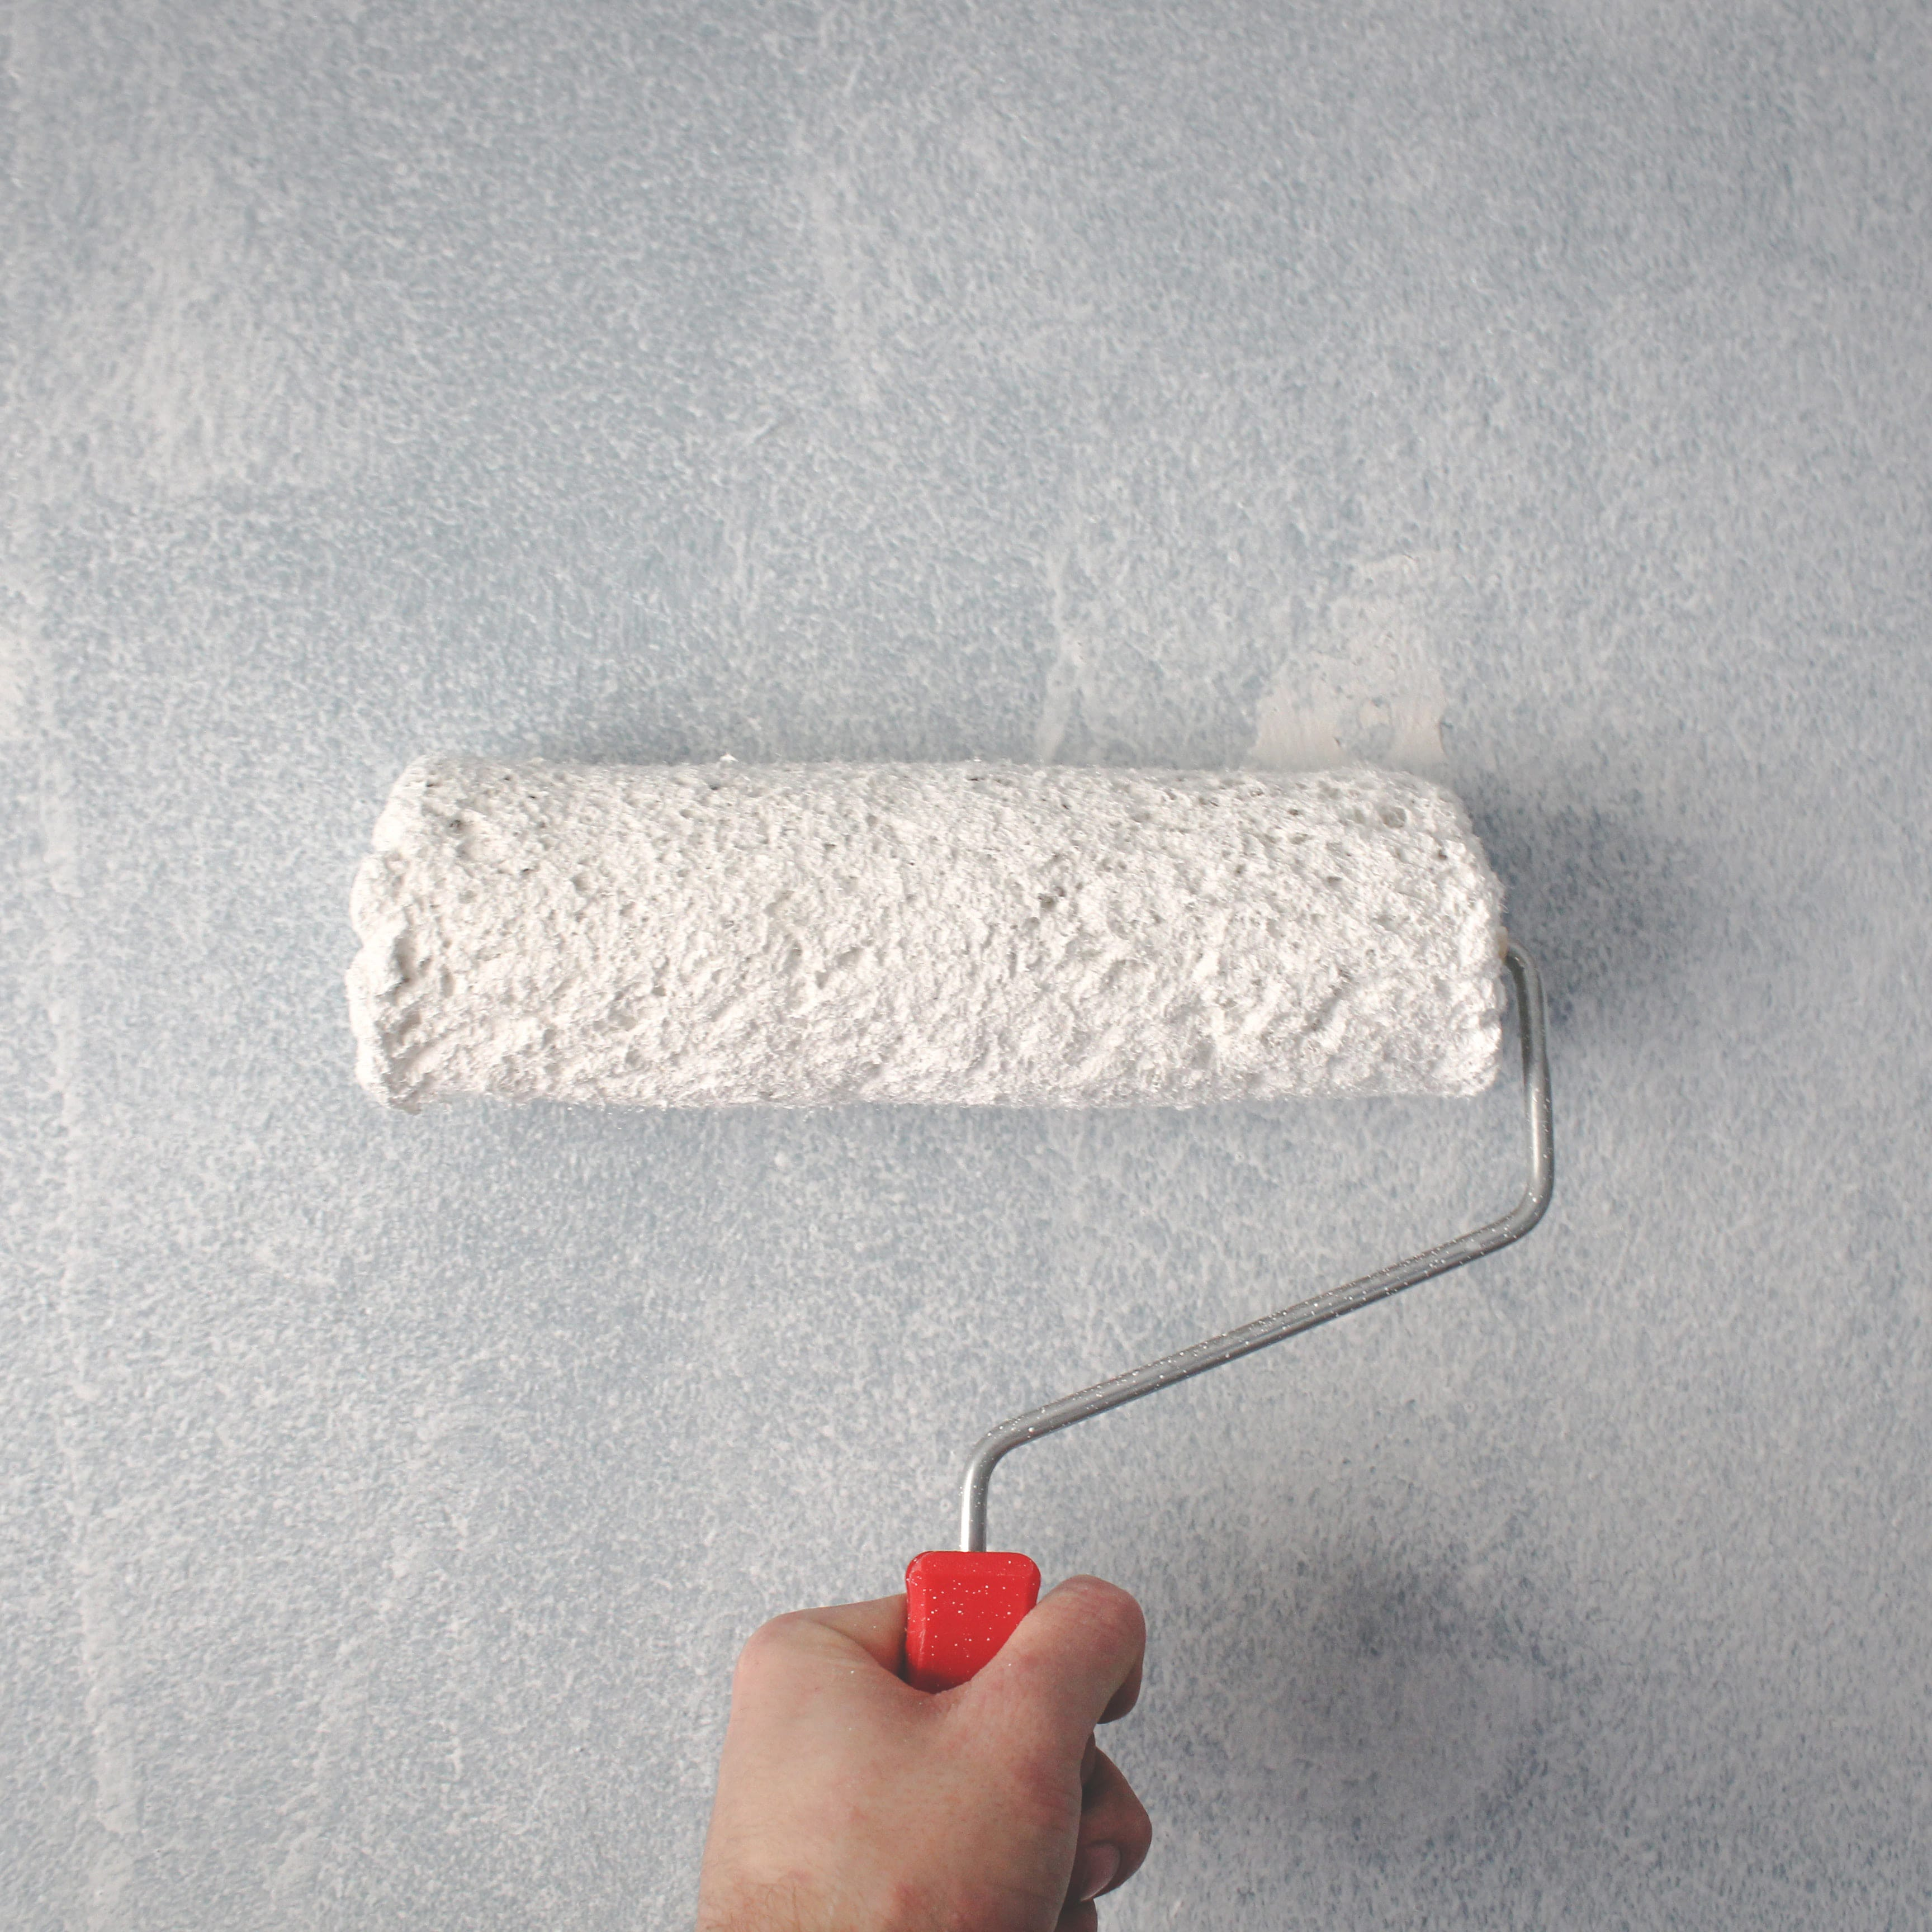 kwaliteit verf materiaal